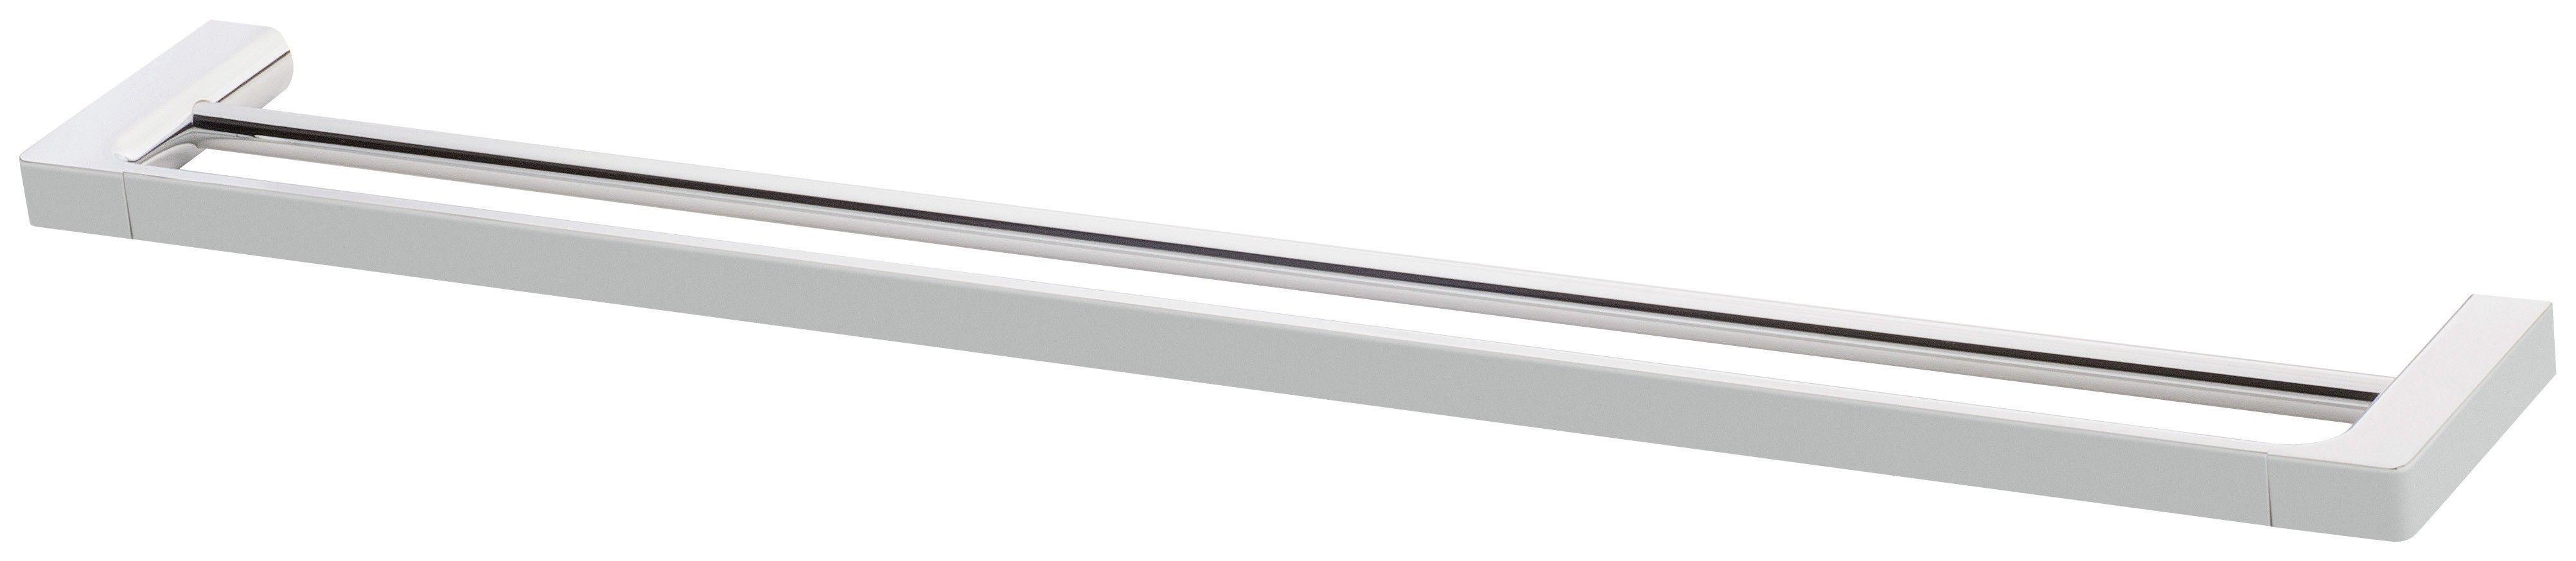 Gloss Double Towel Rail 800mm